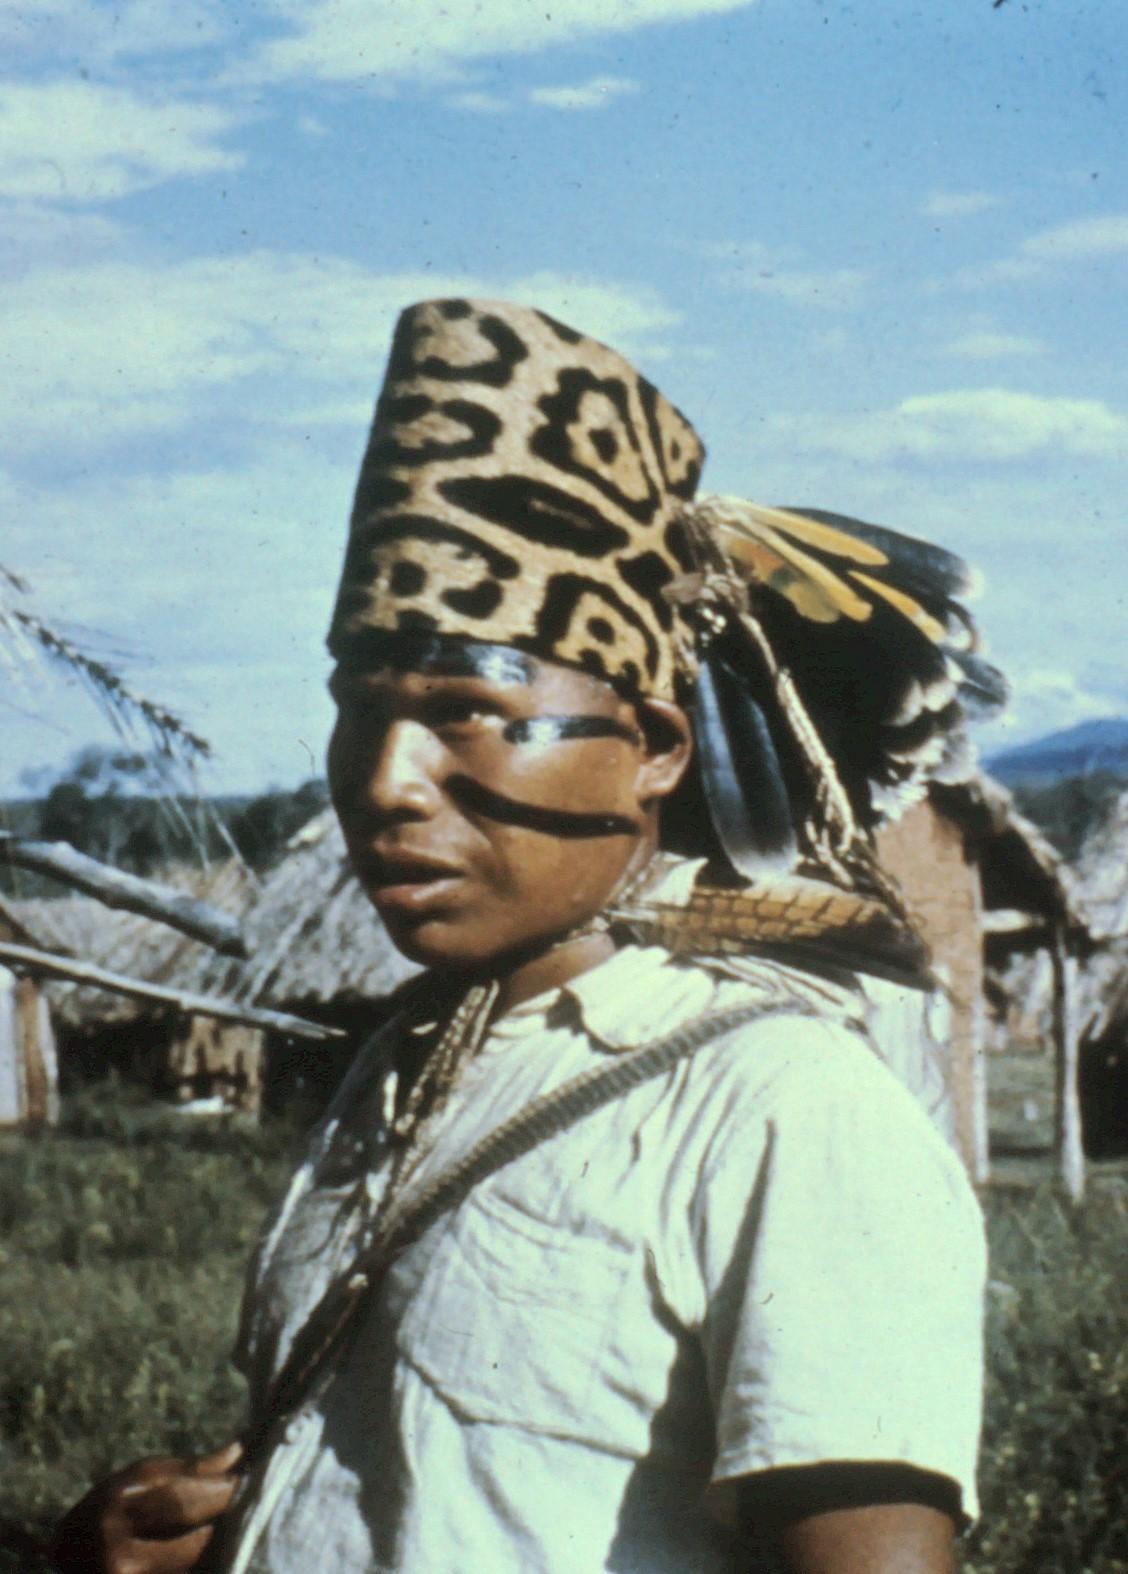 Ayoré asute (chief) in jaguar headdress with facial markings.